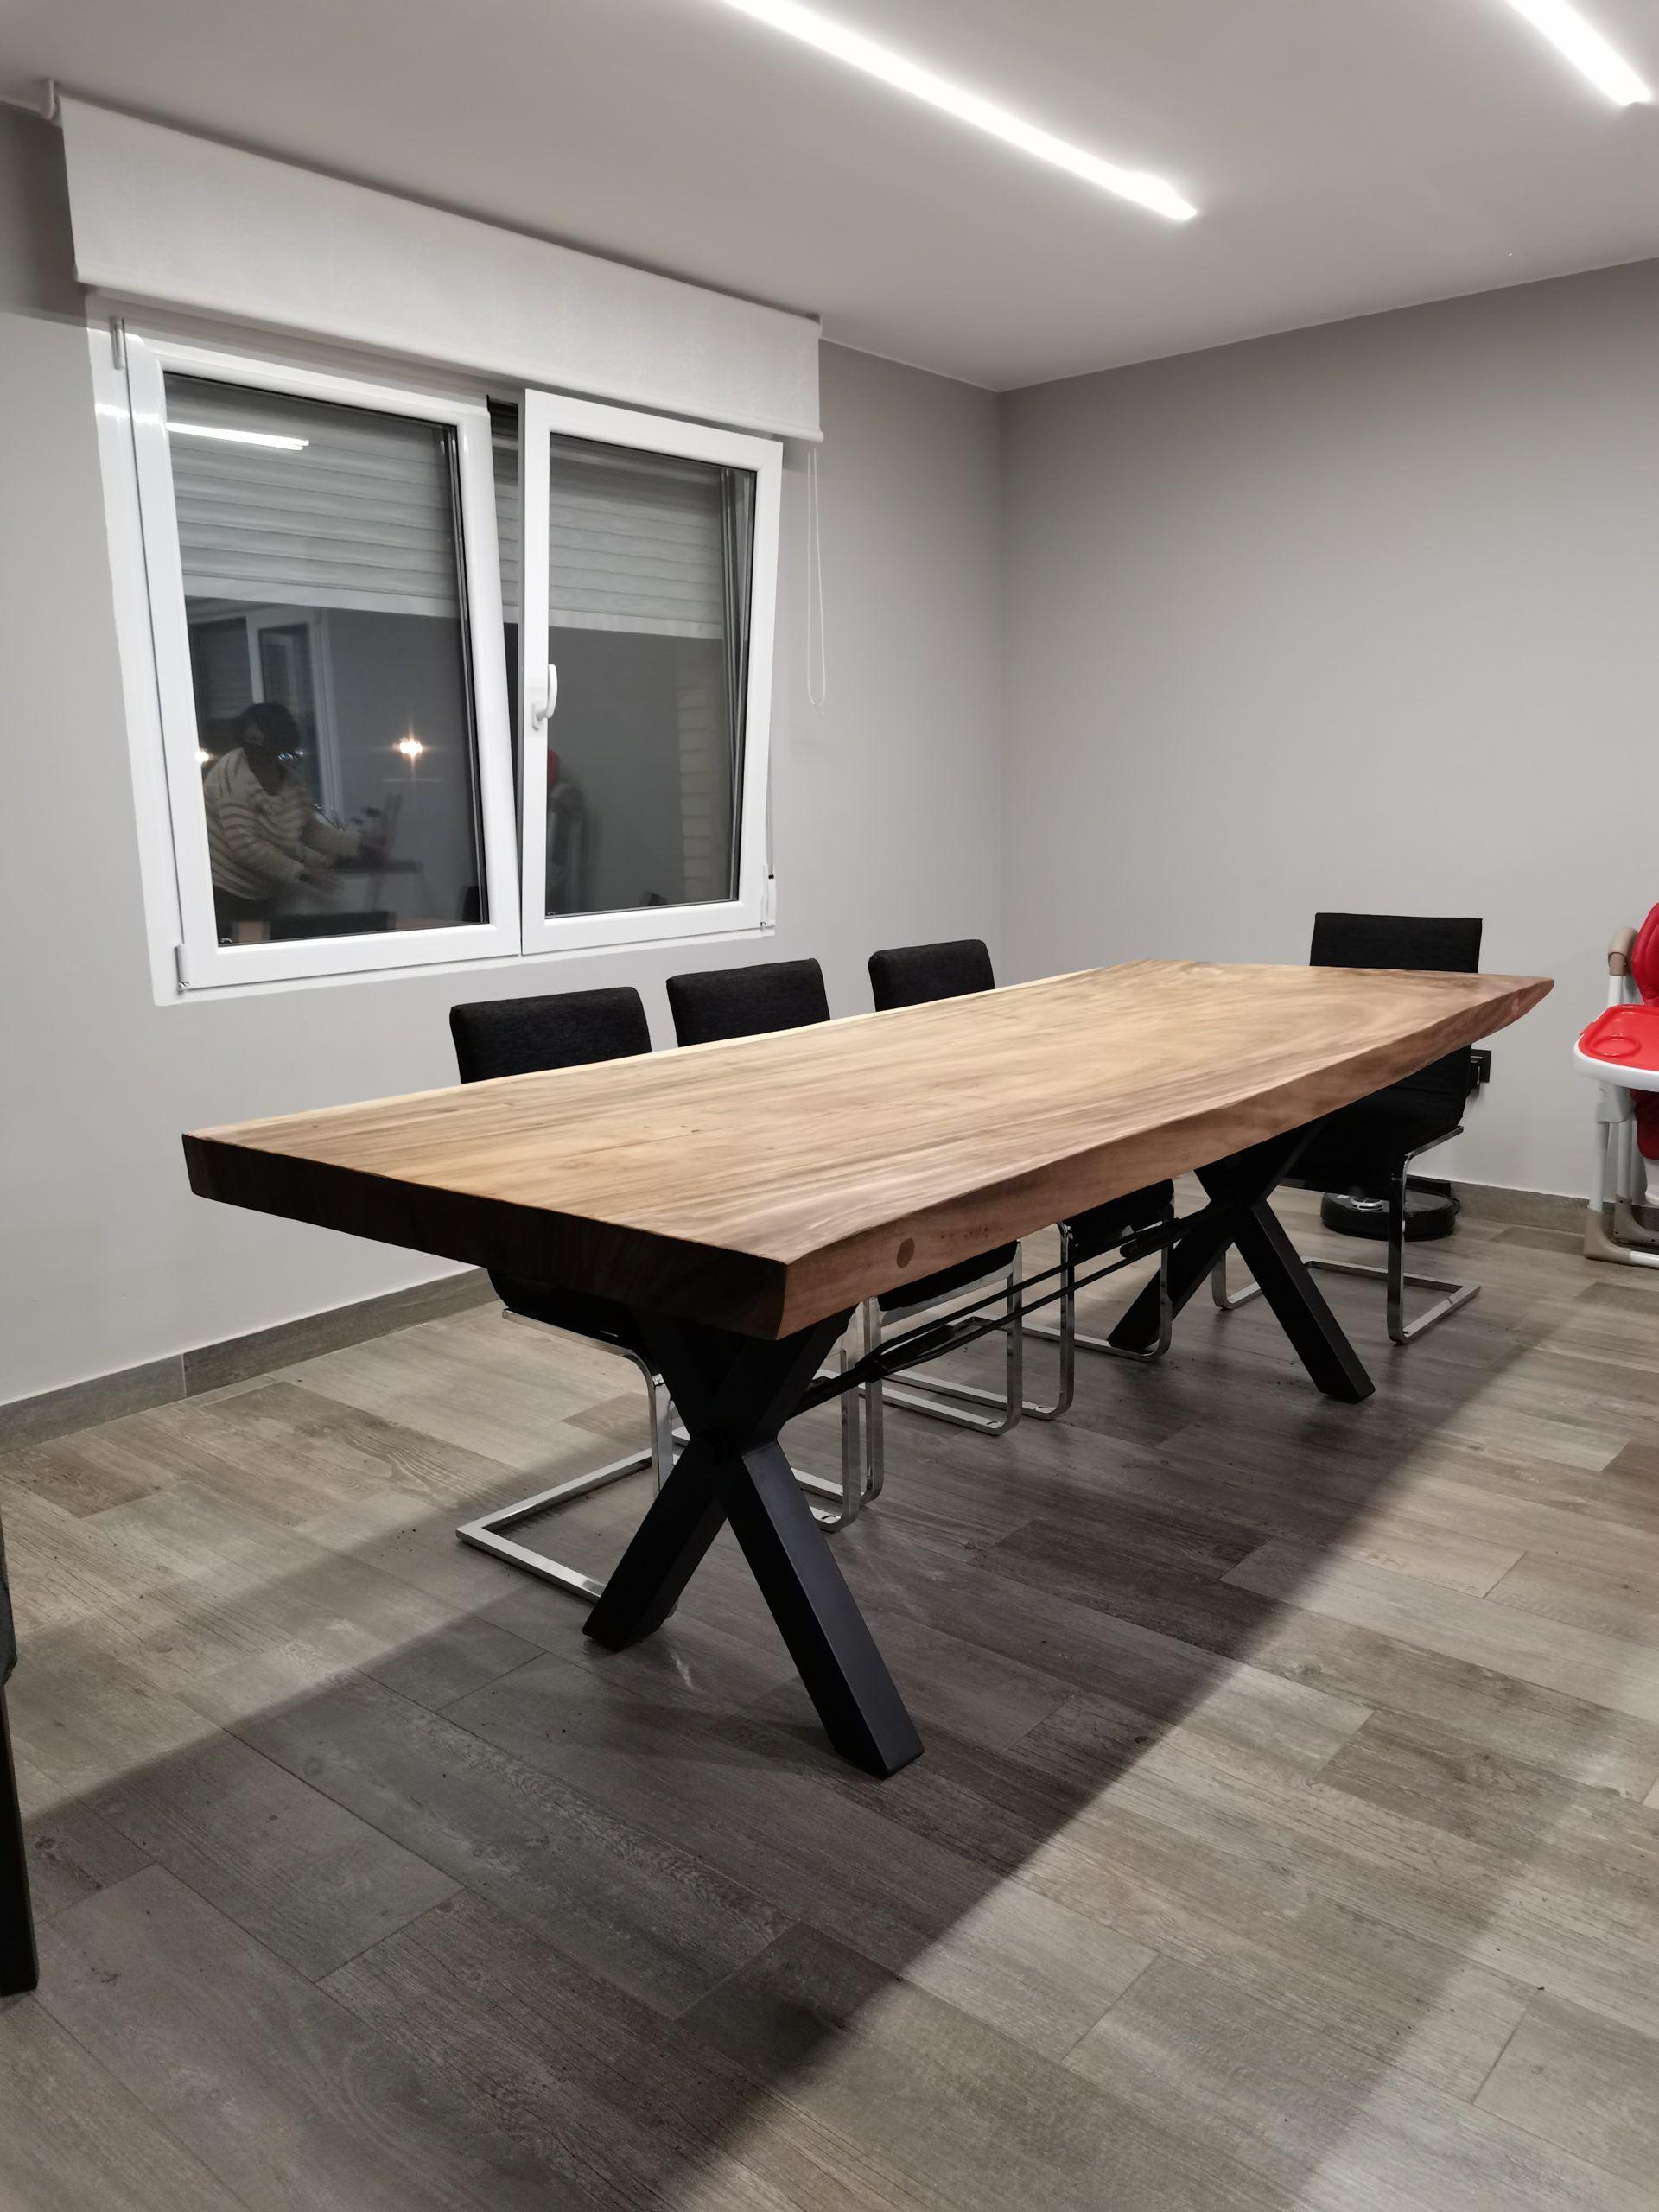 Artybel-mesa-maciza-una-pieza-madera-suar-pata-metalica